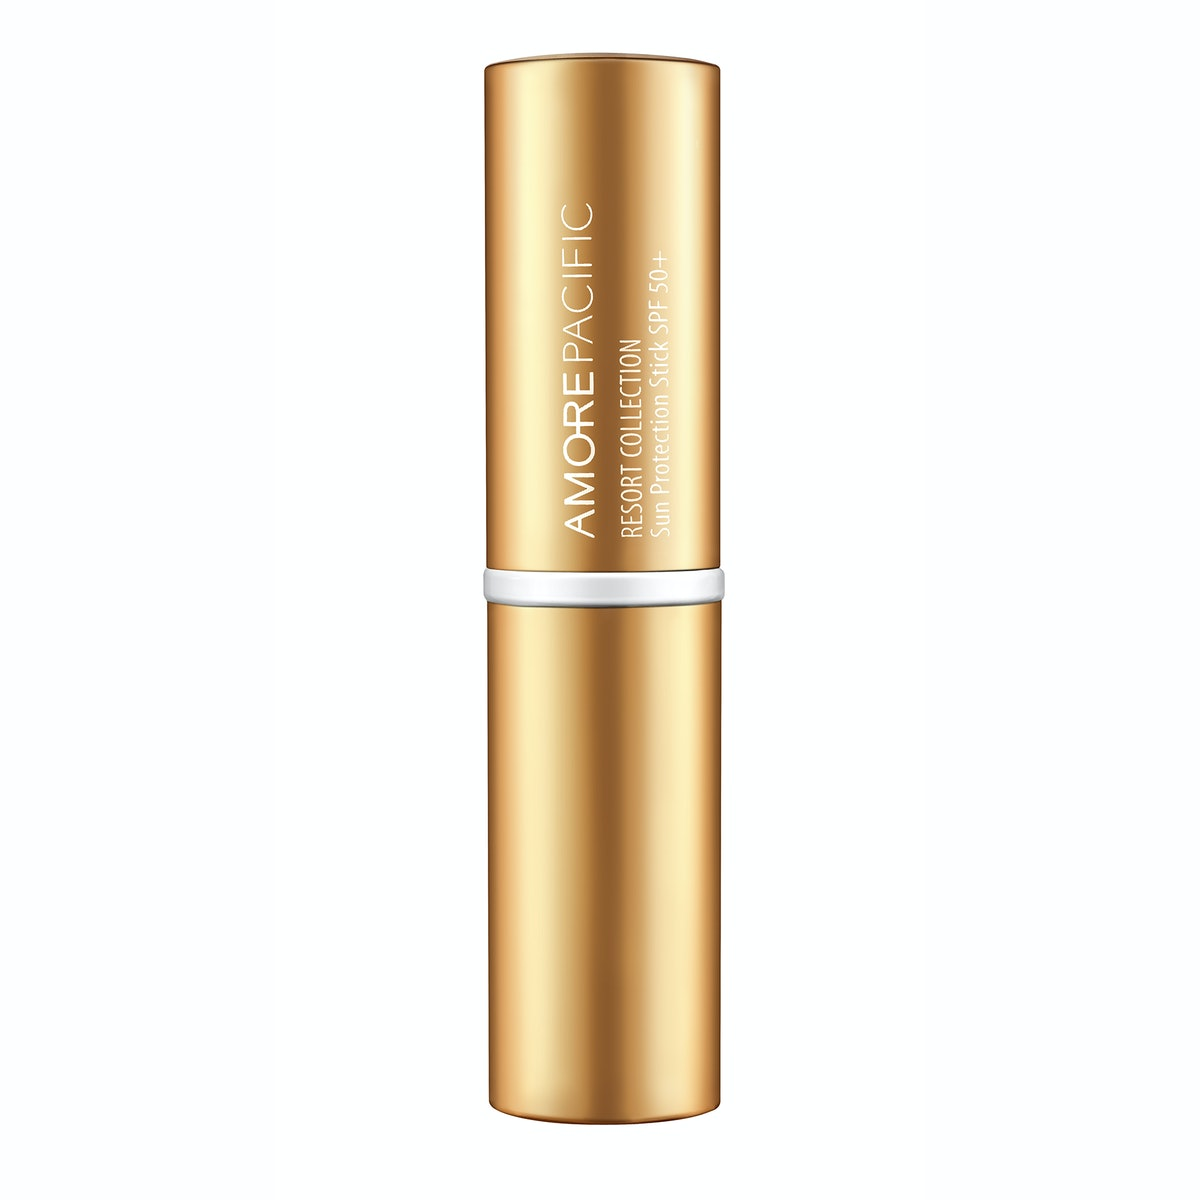 AmorePacific Sun Protection Stick Broad Spectrum SPF 50+